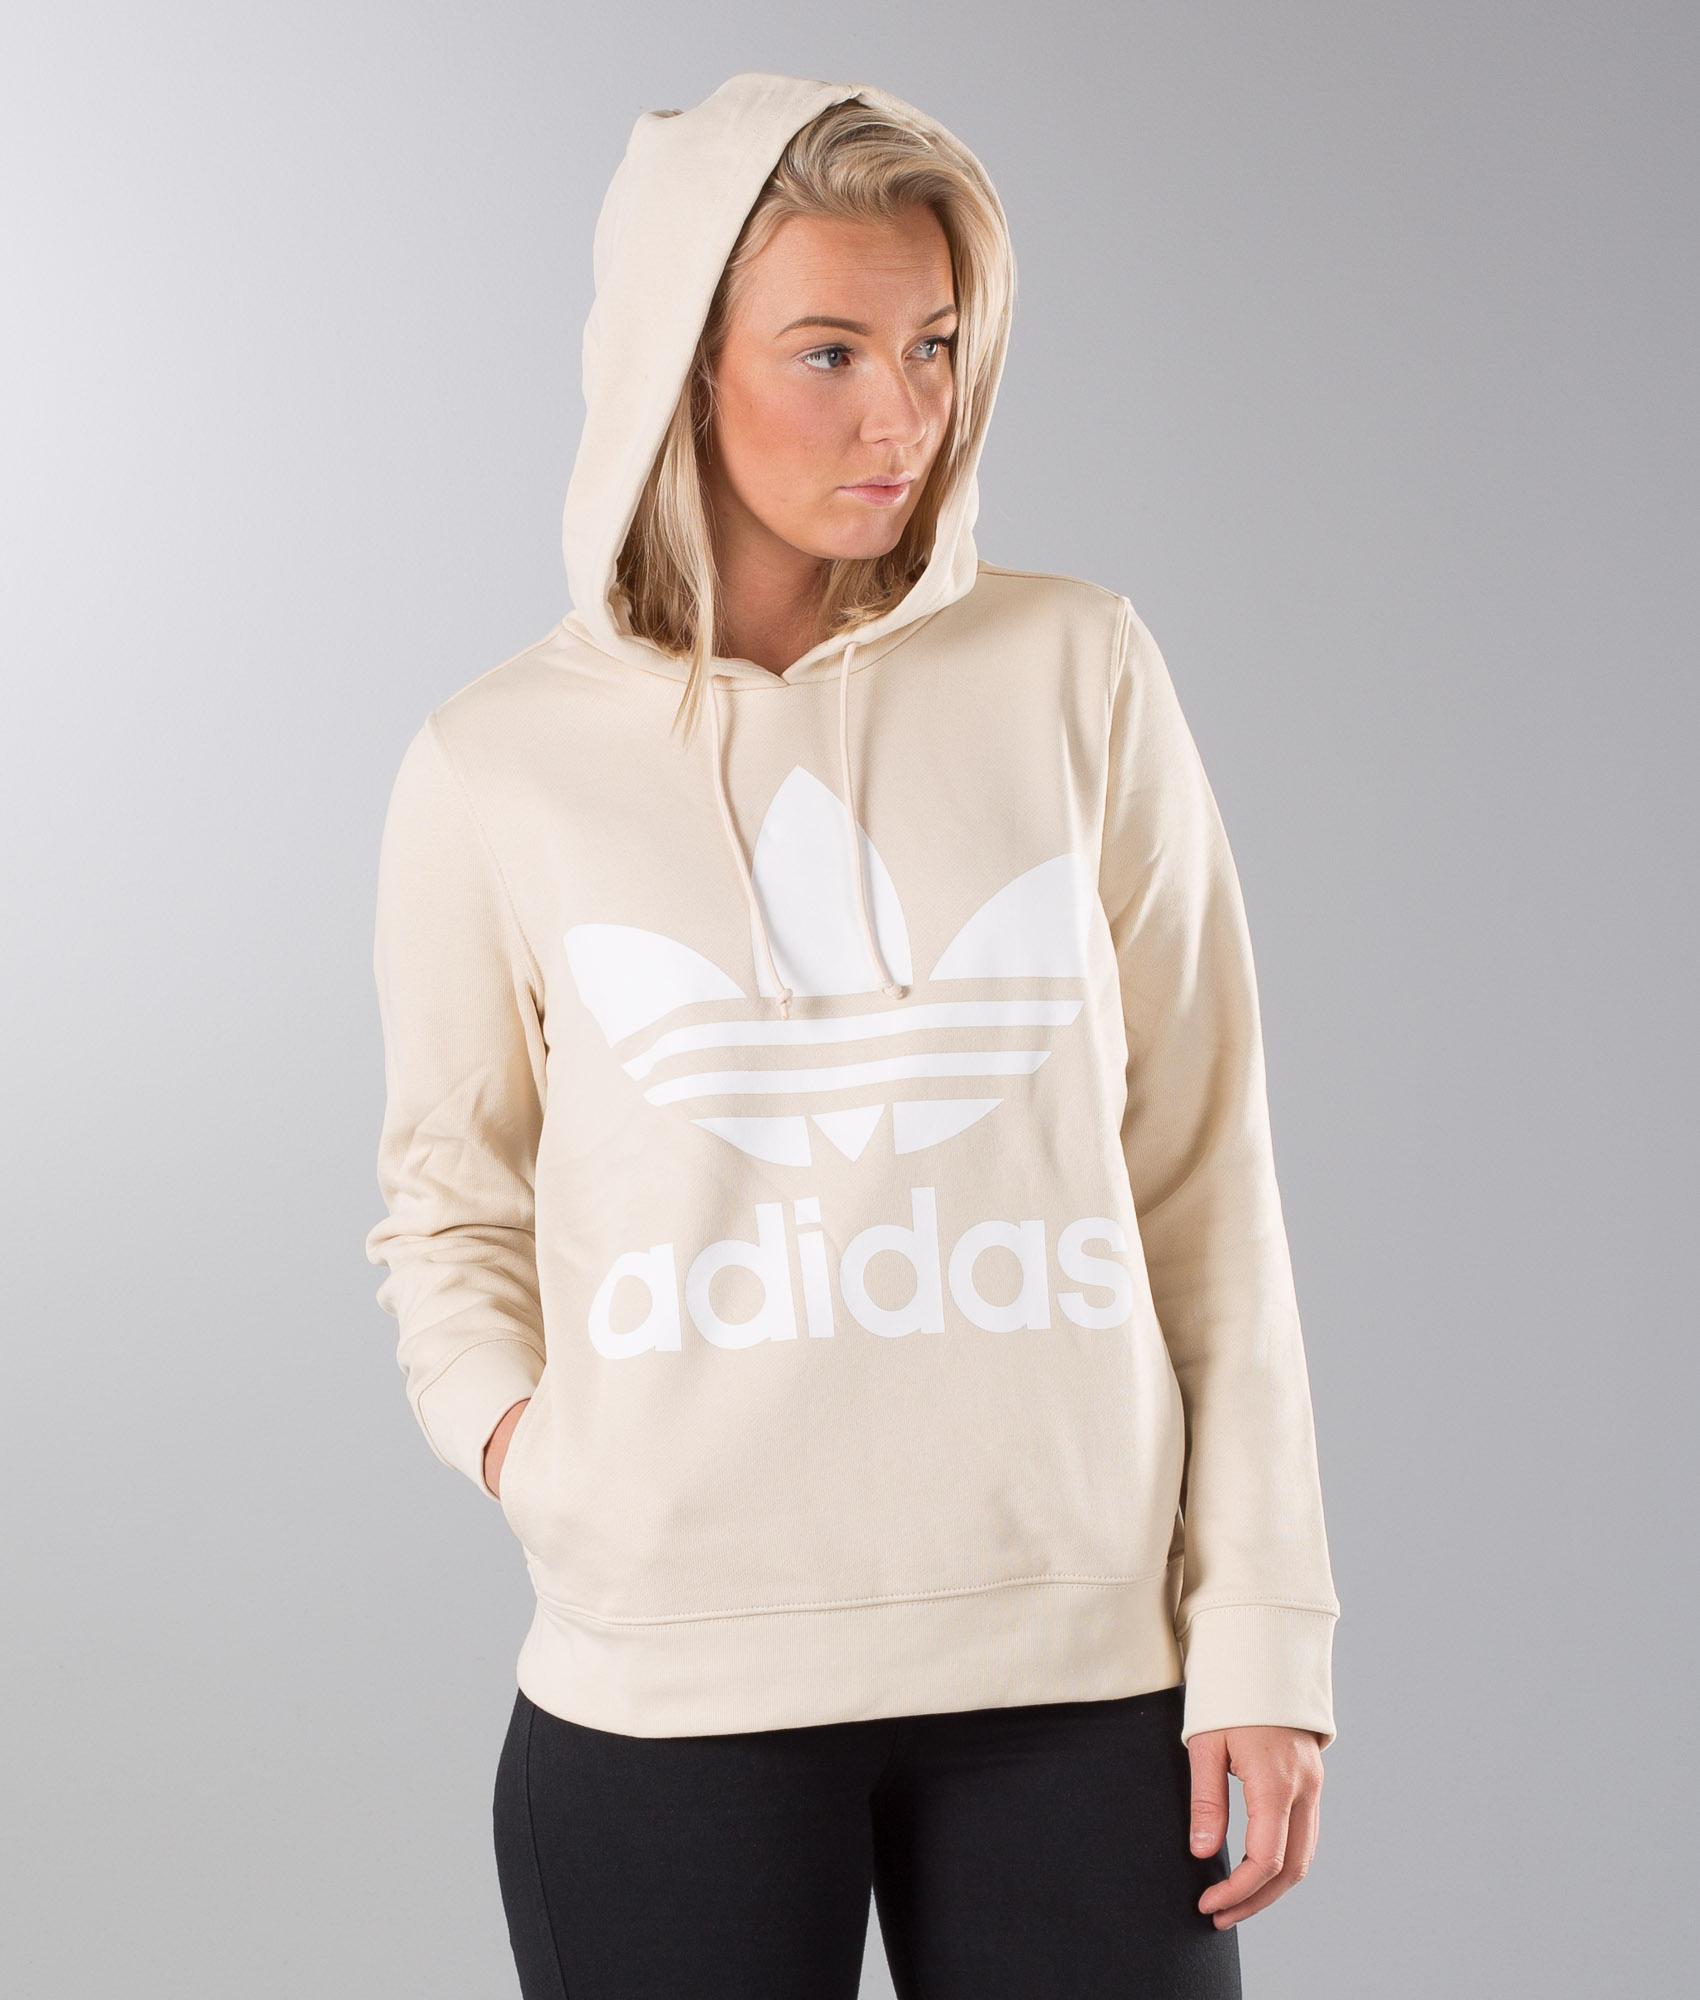 Adidas Originals Trefoil Hoodie Linen